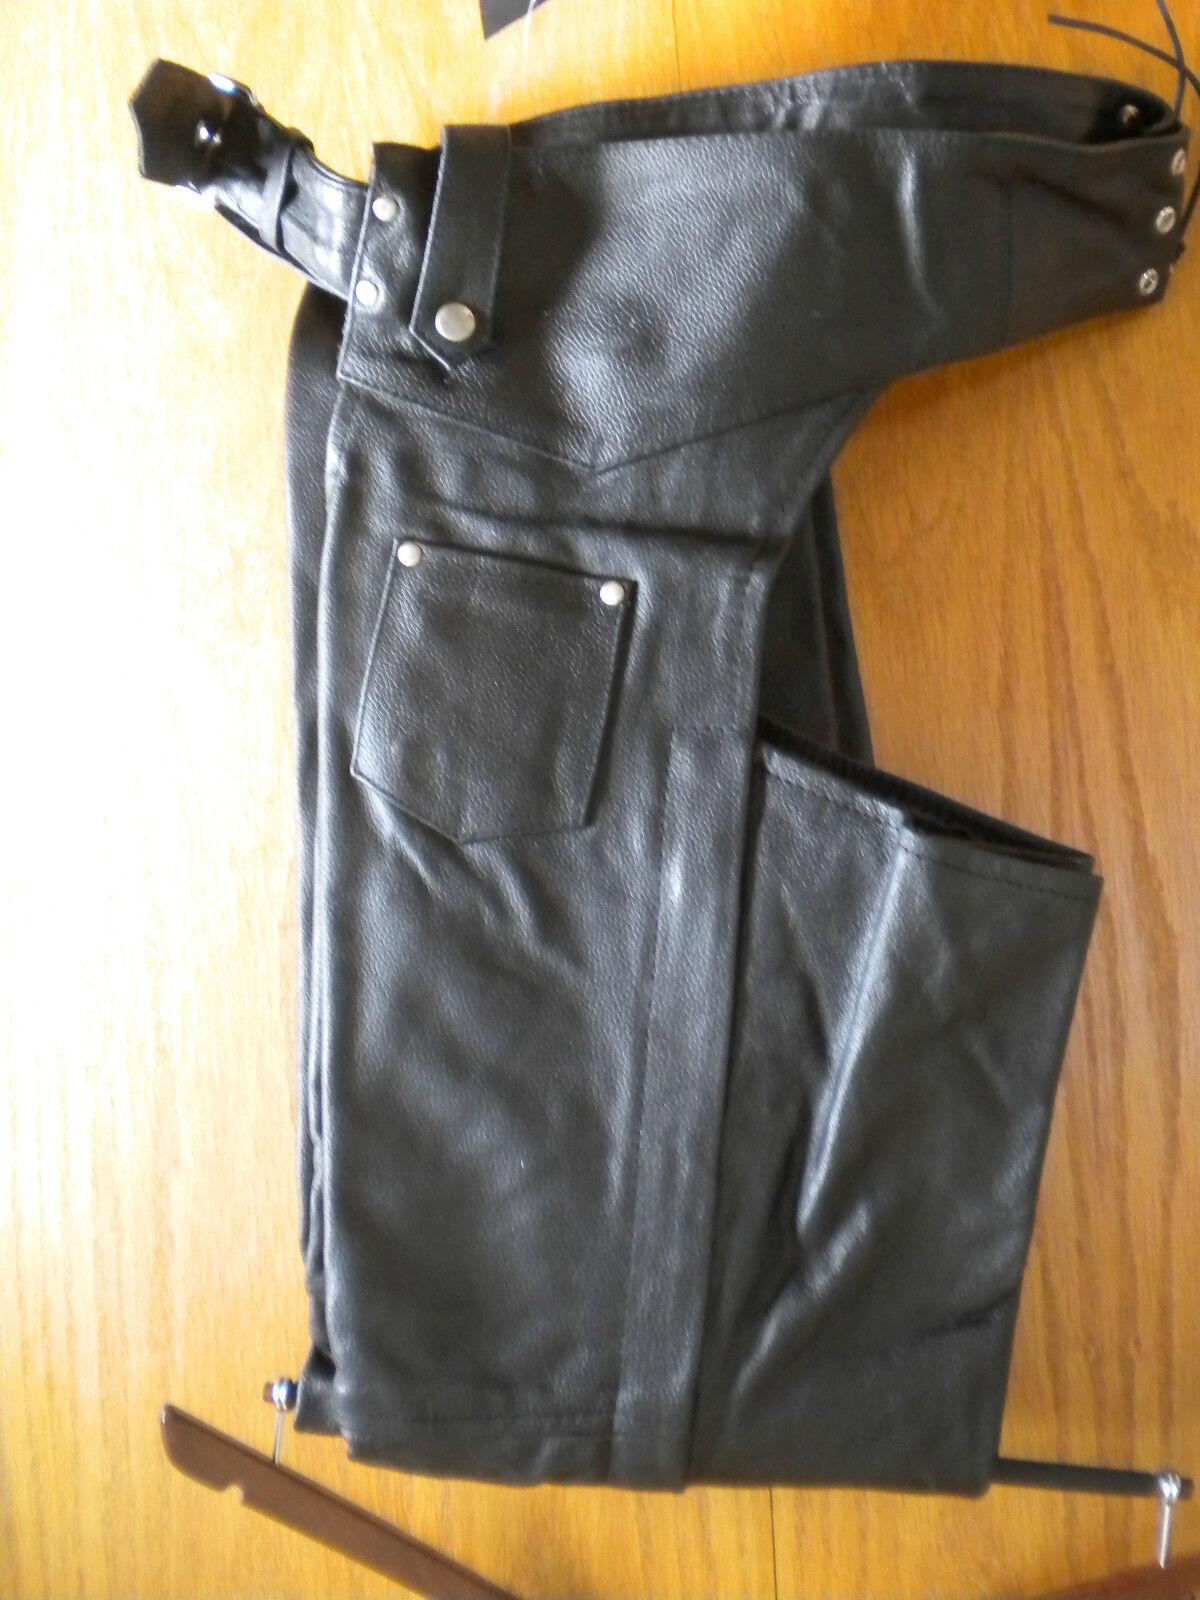 SALE AL2406  Ladies Soft 1Pc. Cowhide Leather Motorcycle Chaps  Full Leg Liner